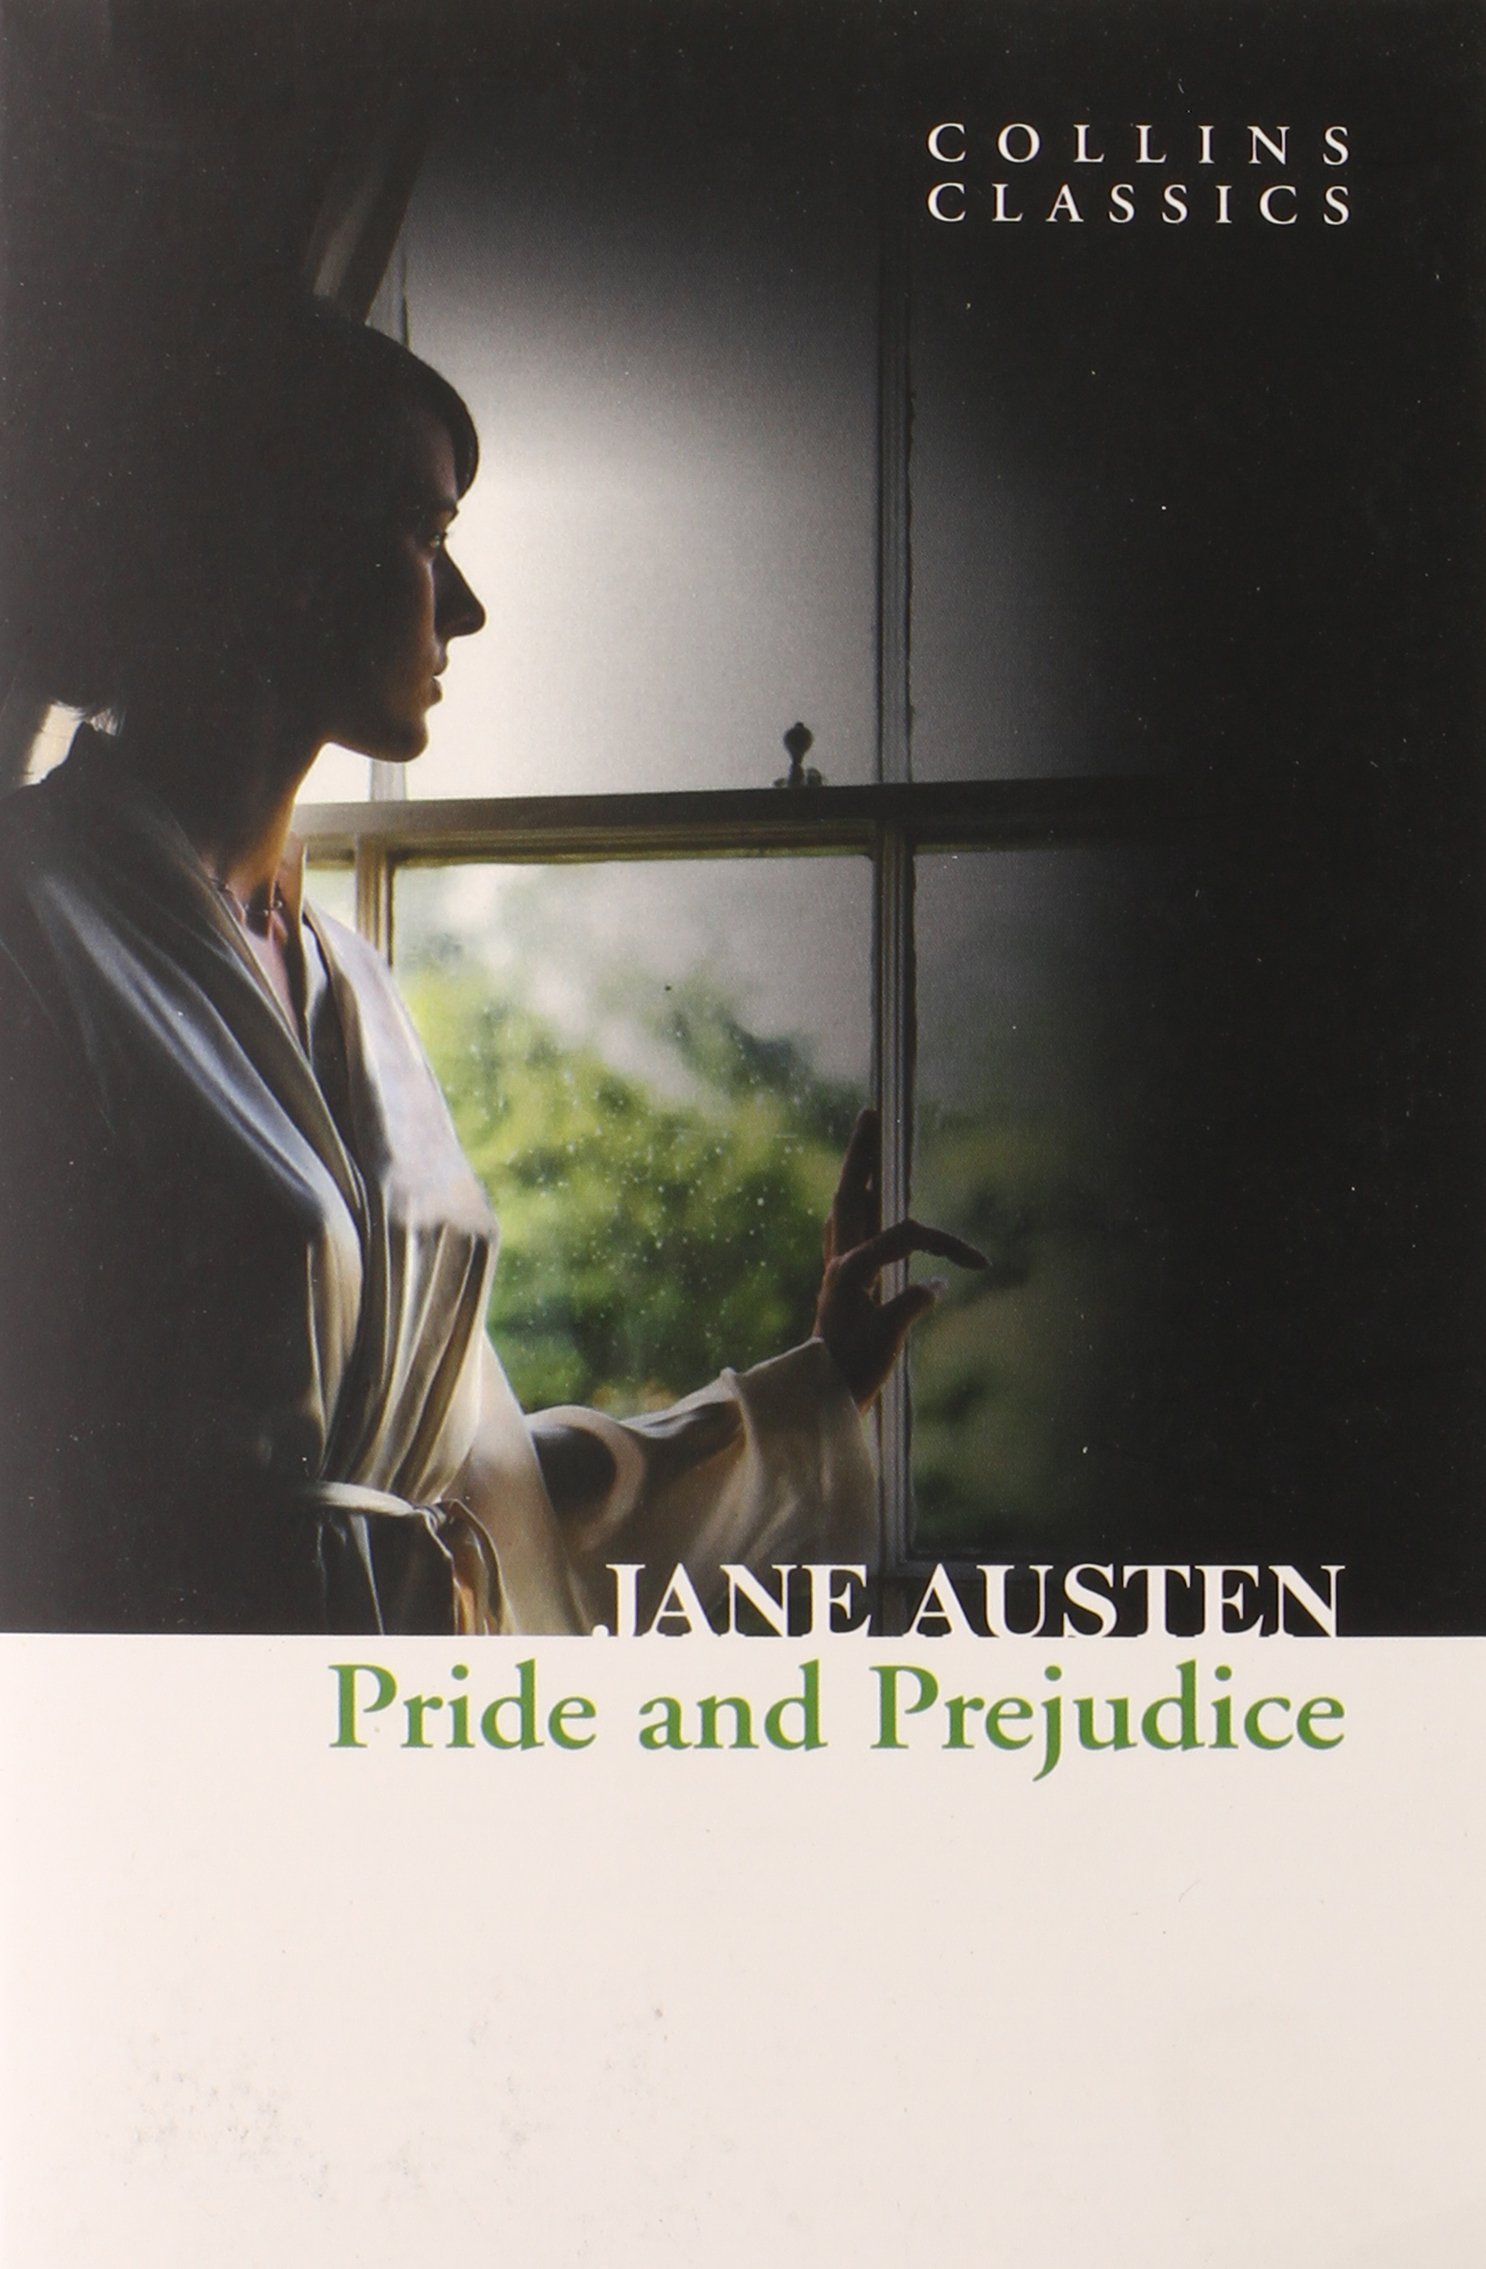 pride and prejudice collins classics jane austen 9780007350773 pride and prejudice collins classics jane austen 9780007350773 literature